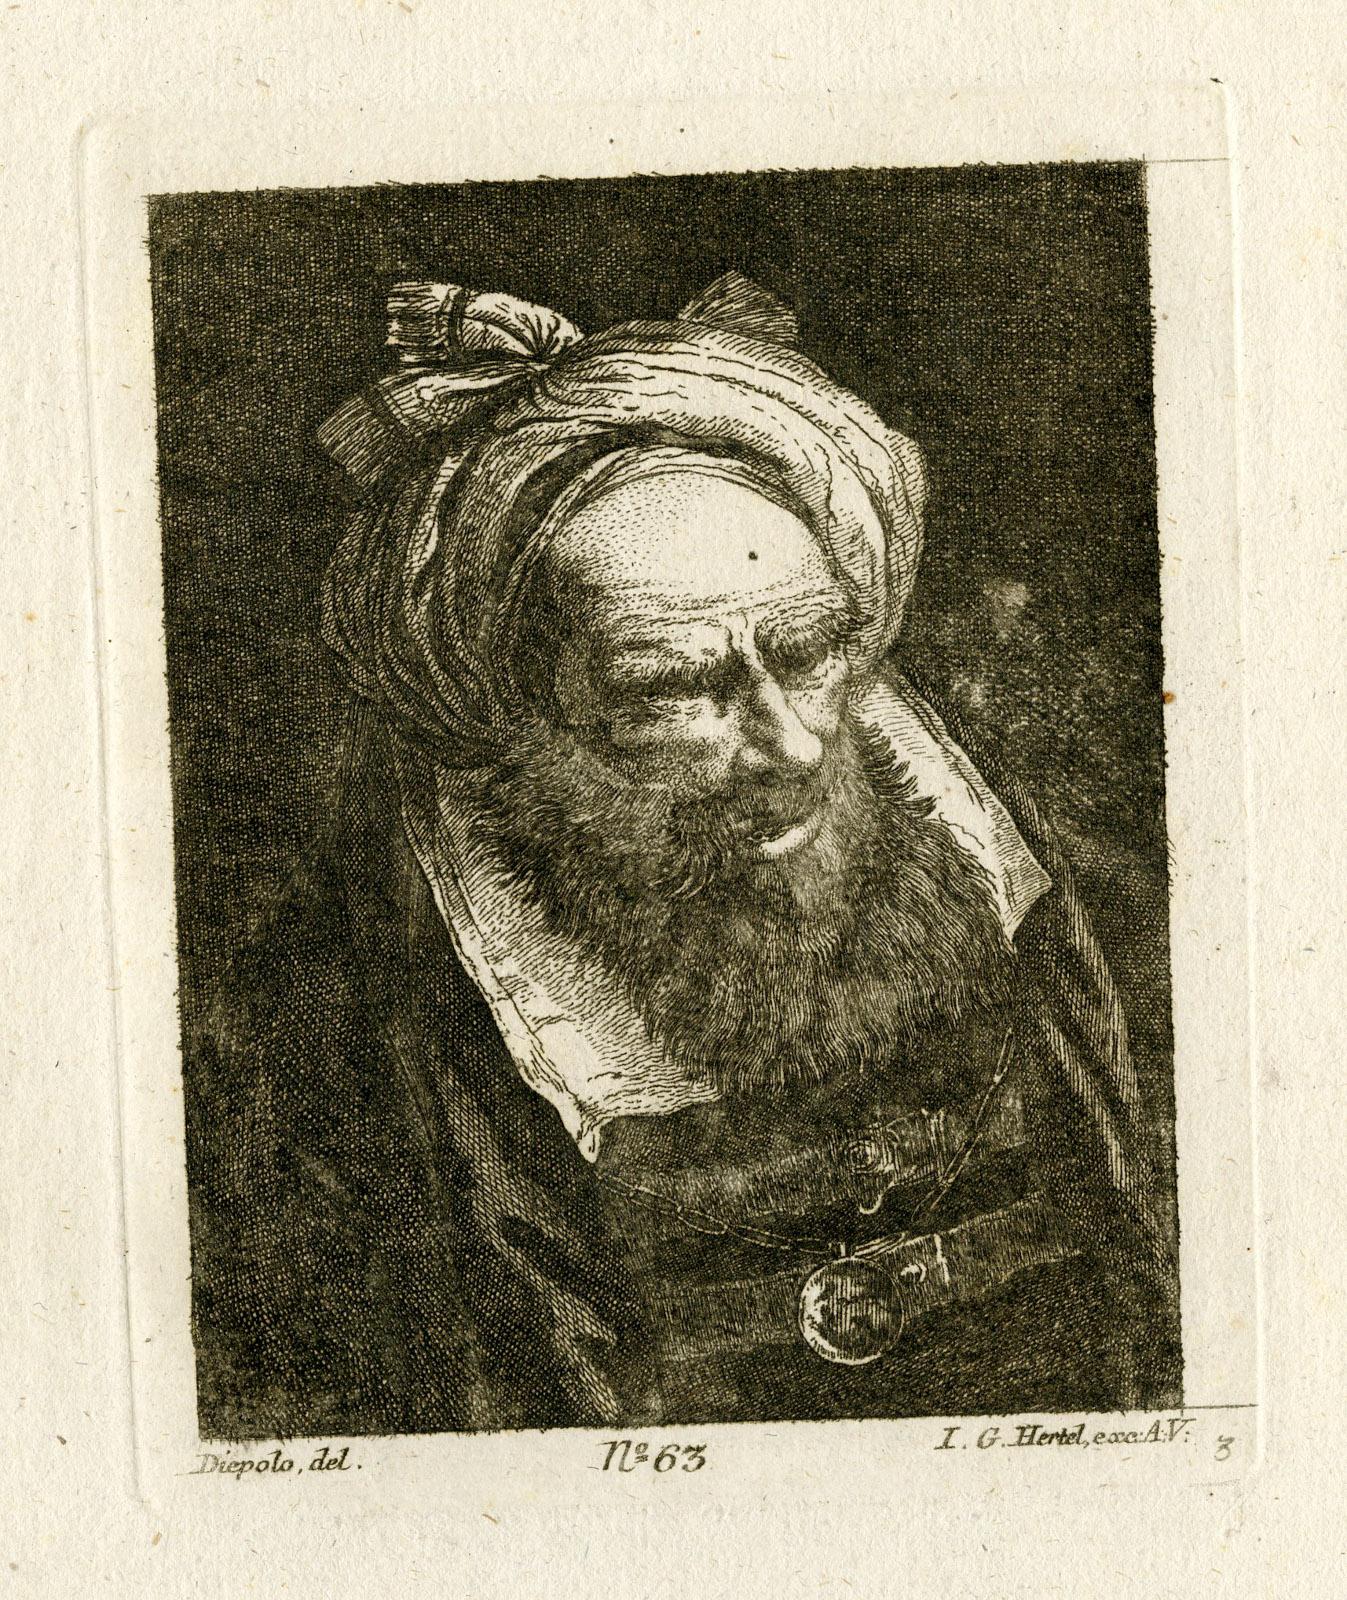 Antique Master Print-BEARDED MAN WITH TURBAN-Tiepolo-Hertel-c.1760: Johann Georg Hertel